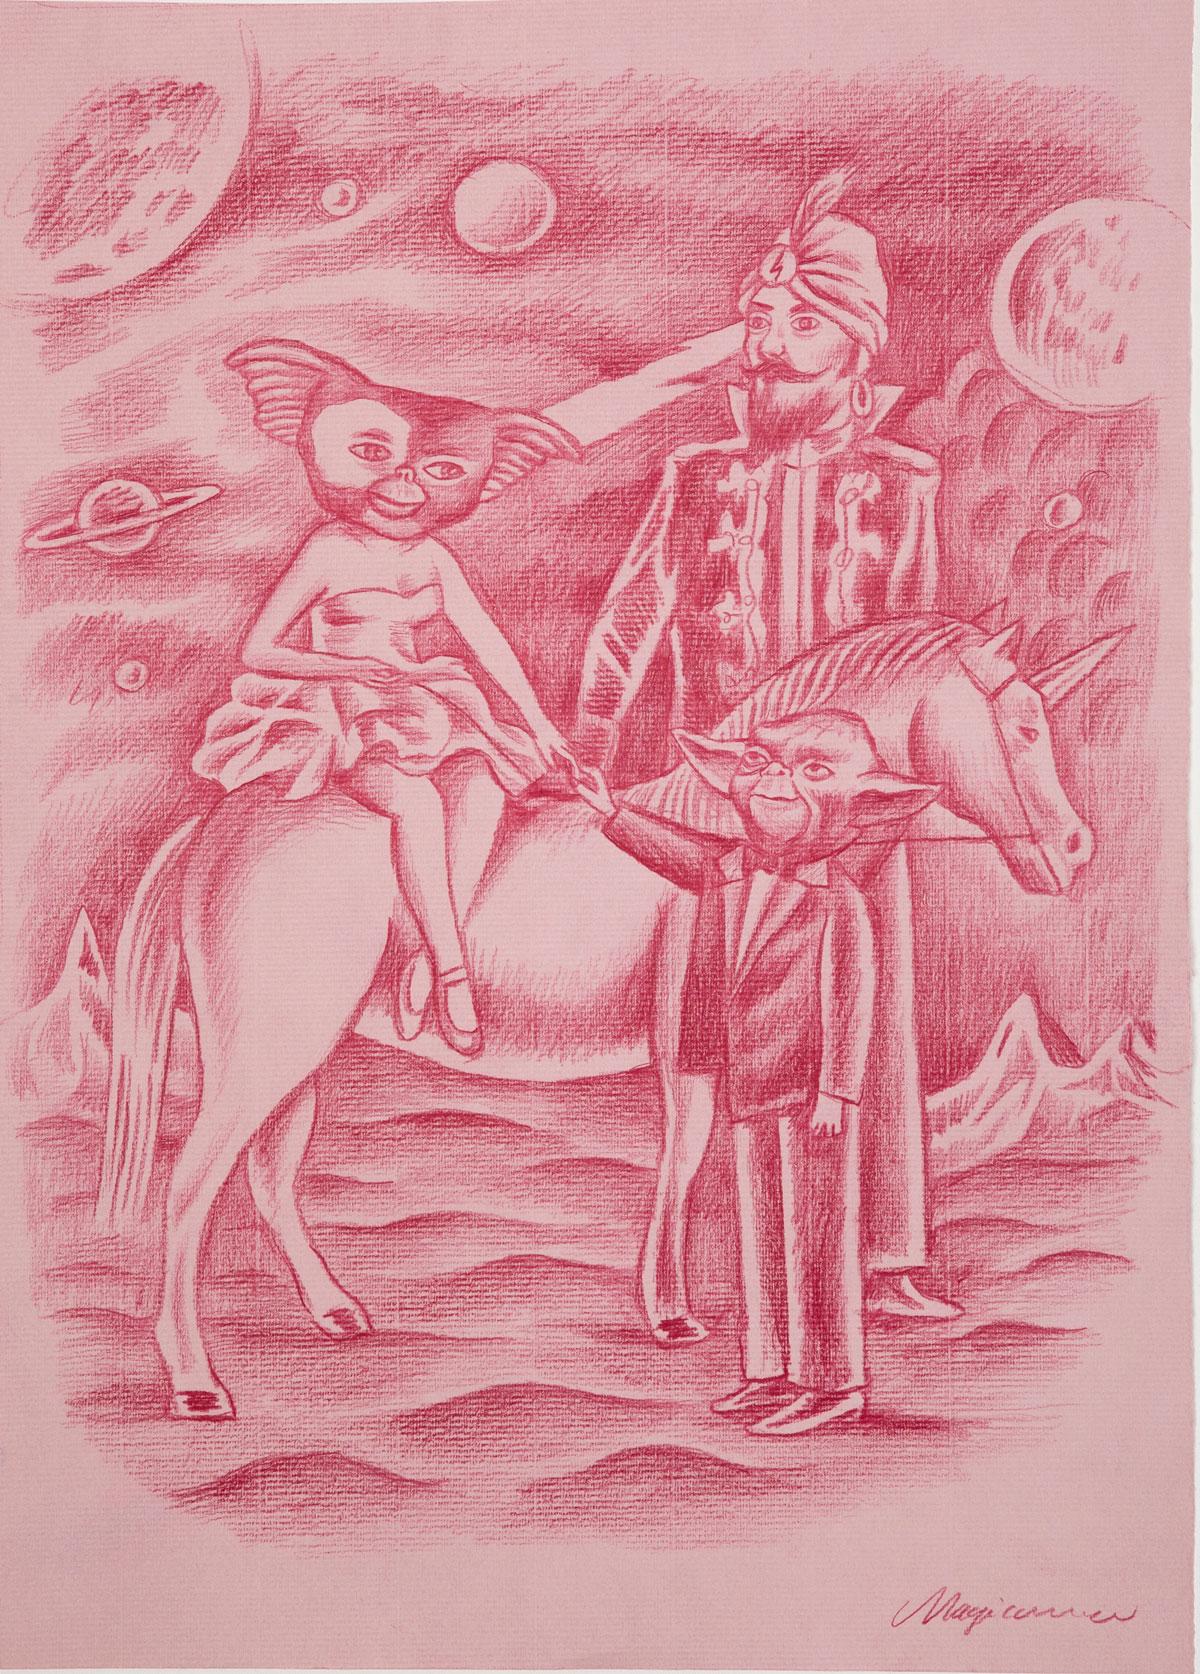 Sergio Mora, Ask to Zoltar, 2019, pencil on paper, 42x30 cm